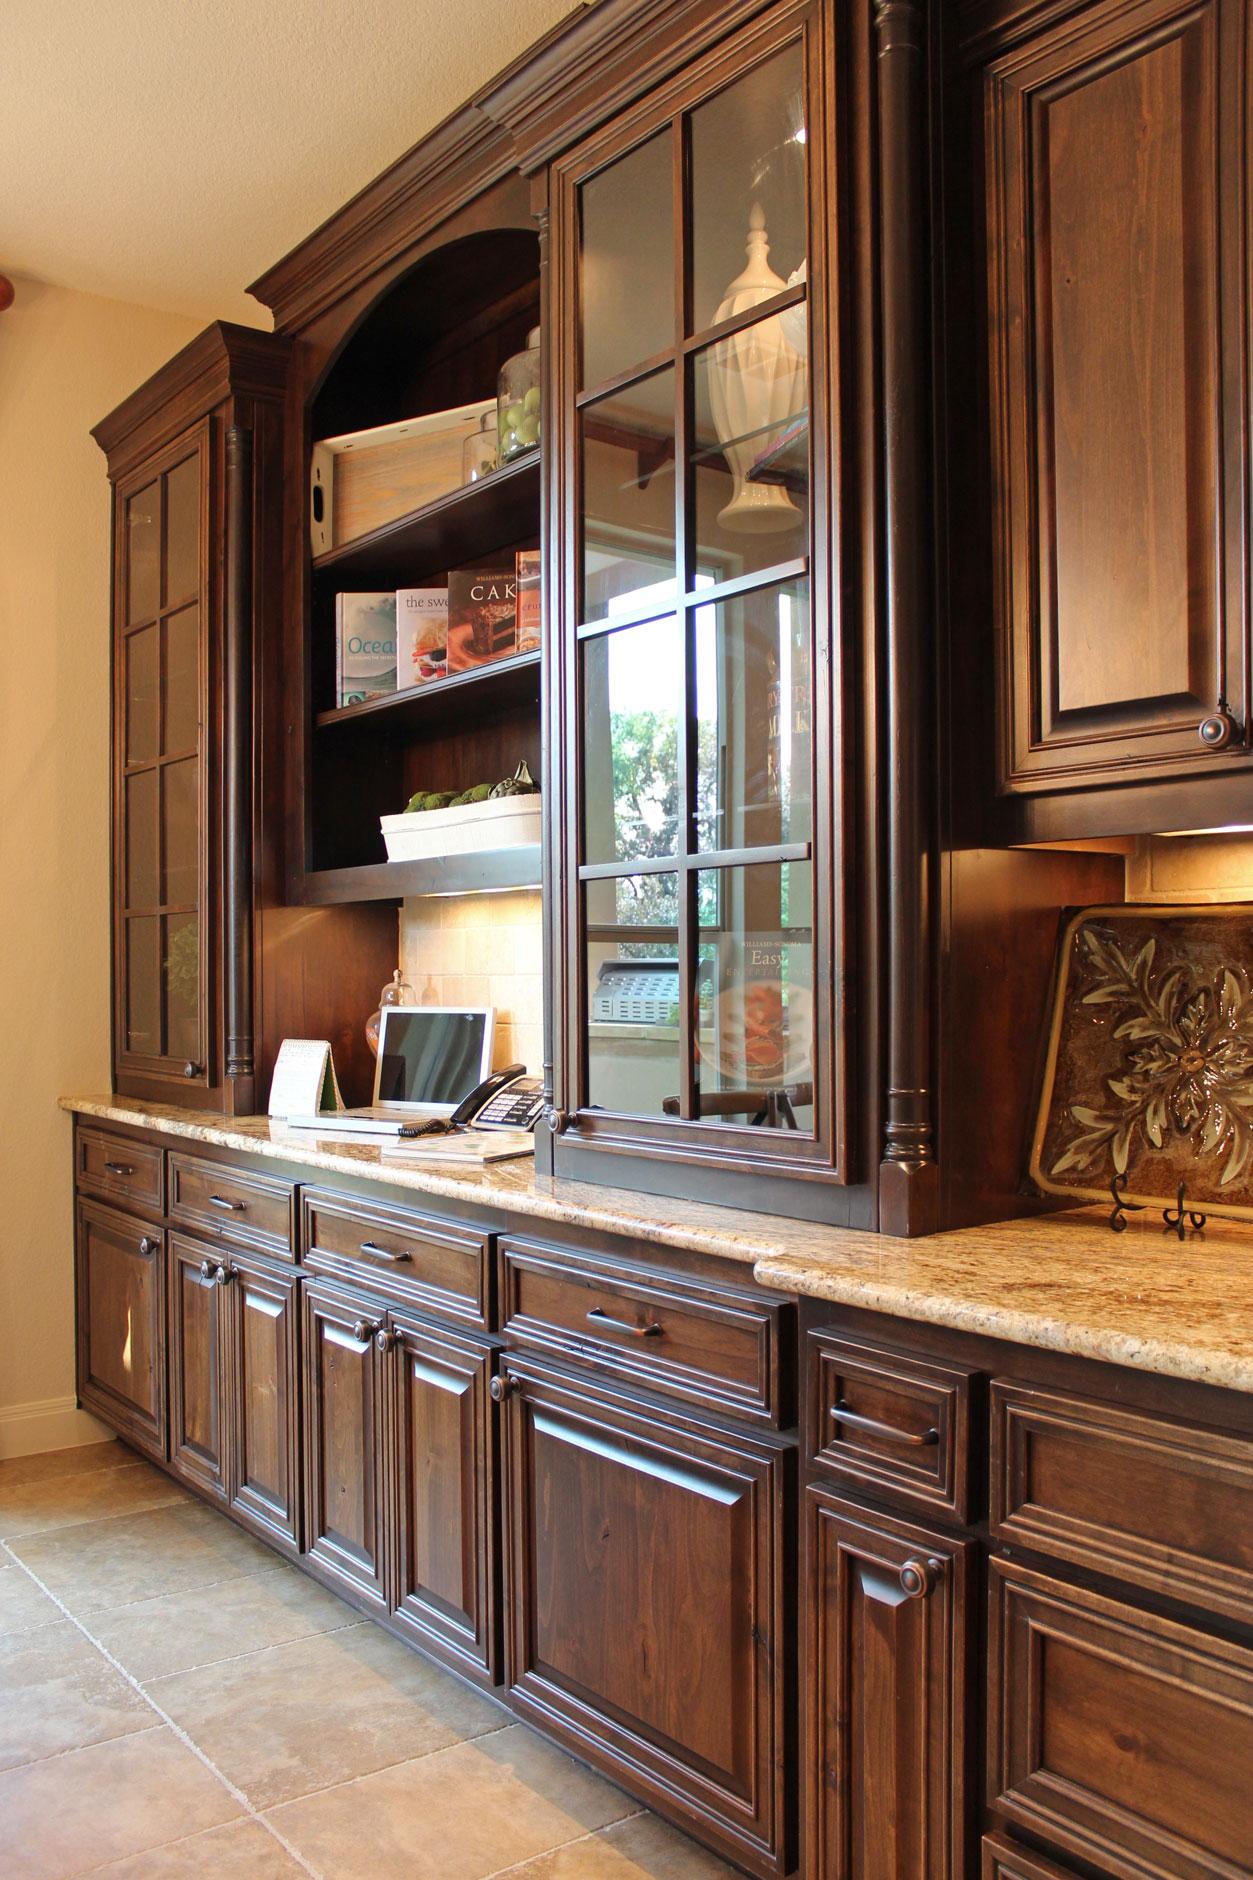 kitchen hutch 1 kitchen hutch cabinets Kitchen Hutch 1 Burrows Cabinets central Texas builder direct custom cabinets